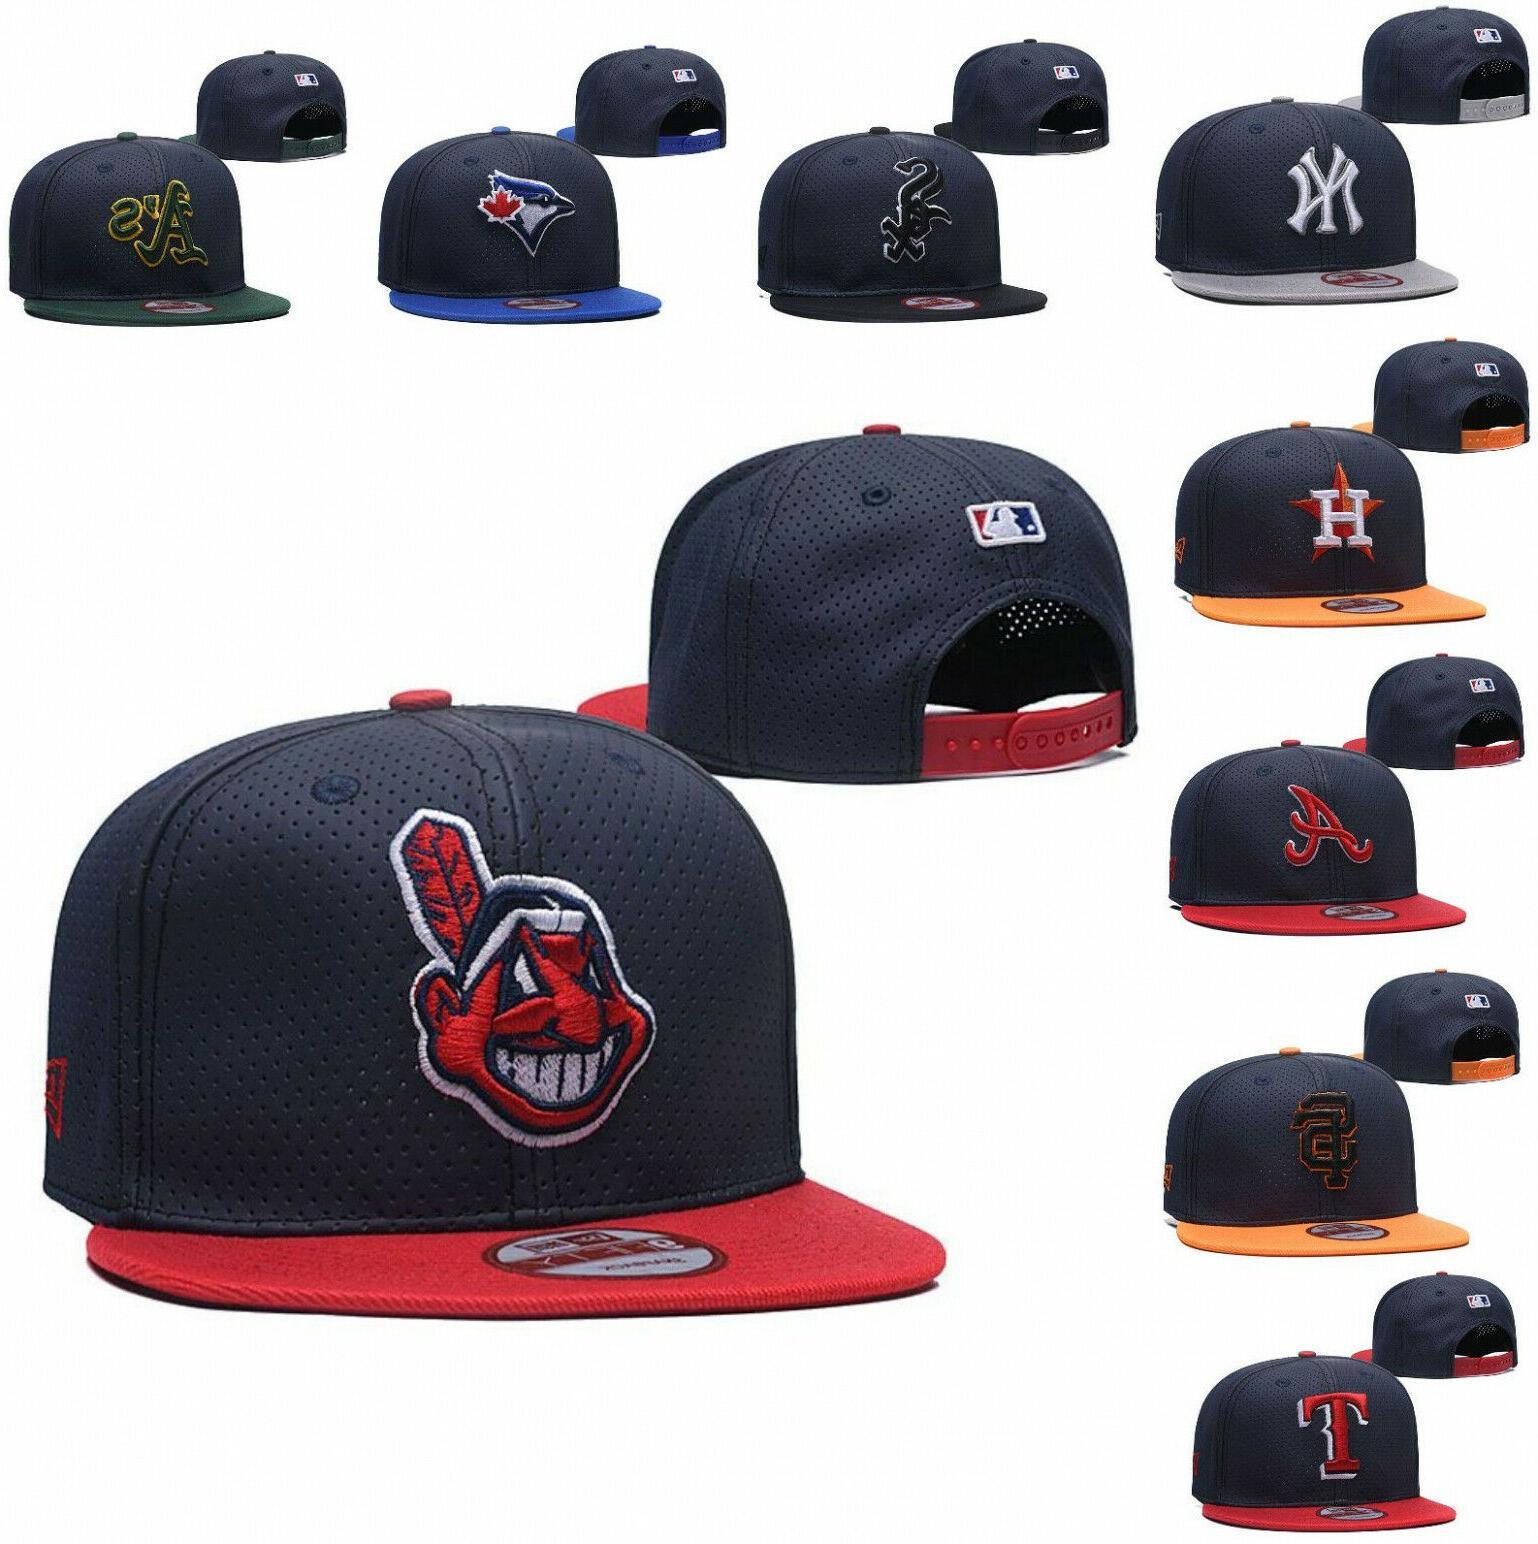 Stylish Embroidered MLB Team Logo Baseball Snapback Adjustable Hat